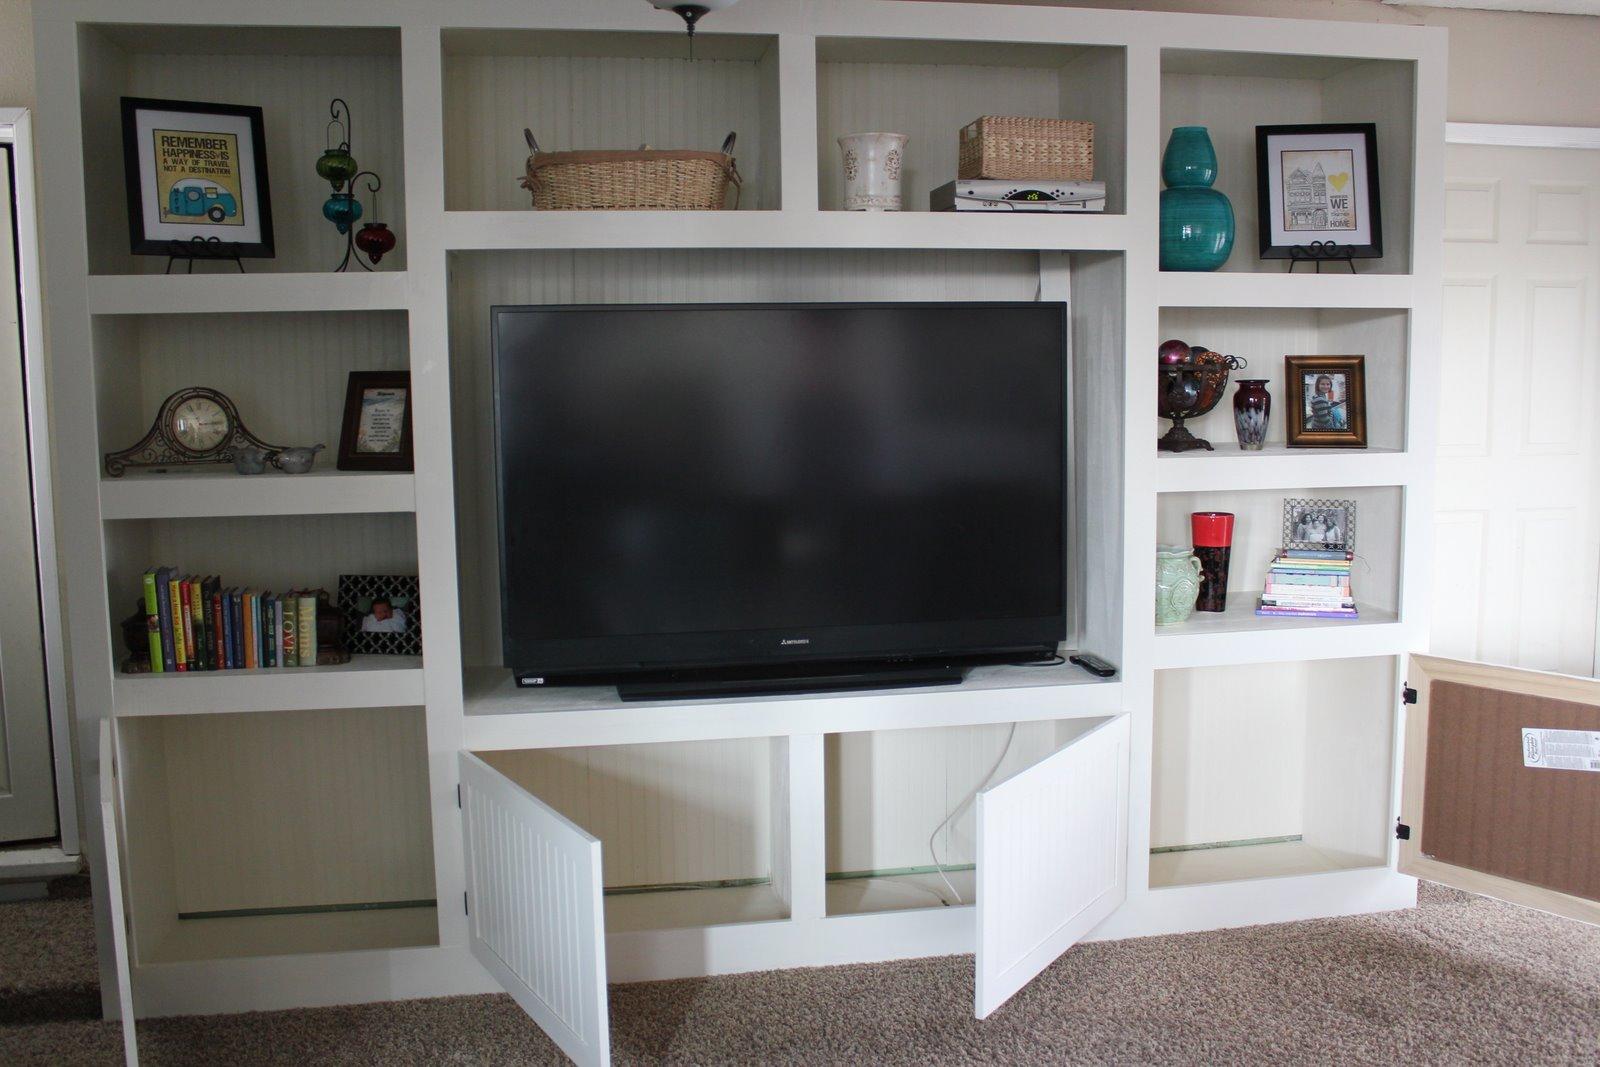 diy entertainment center plans pdf woodworking. Black Bedroom Furniture Sets. Home Design Ideas